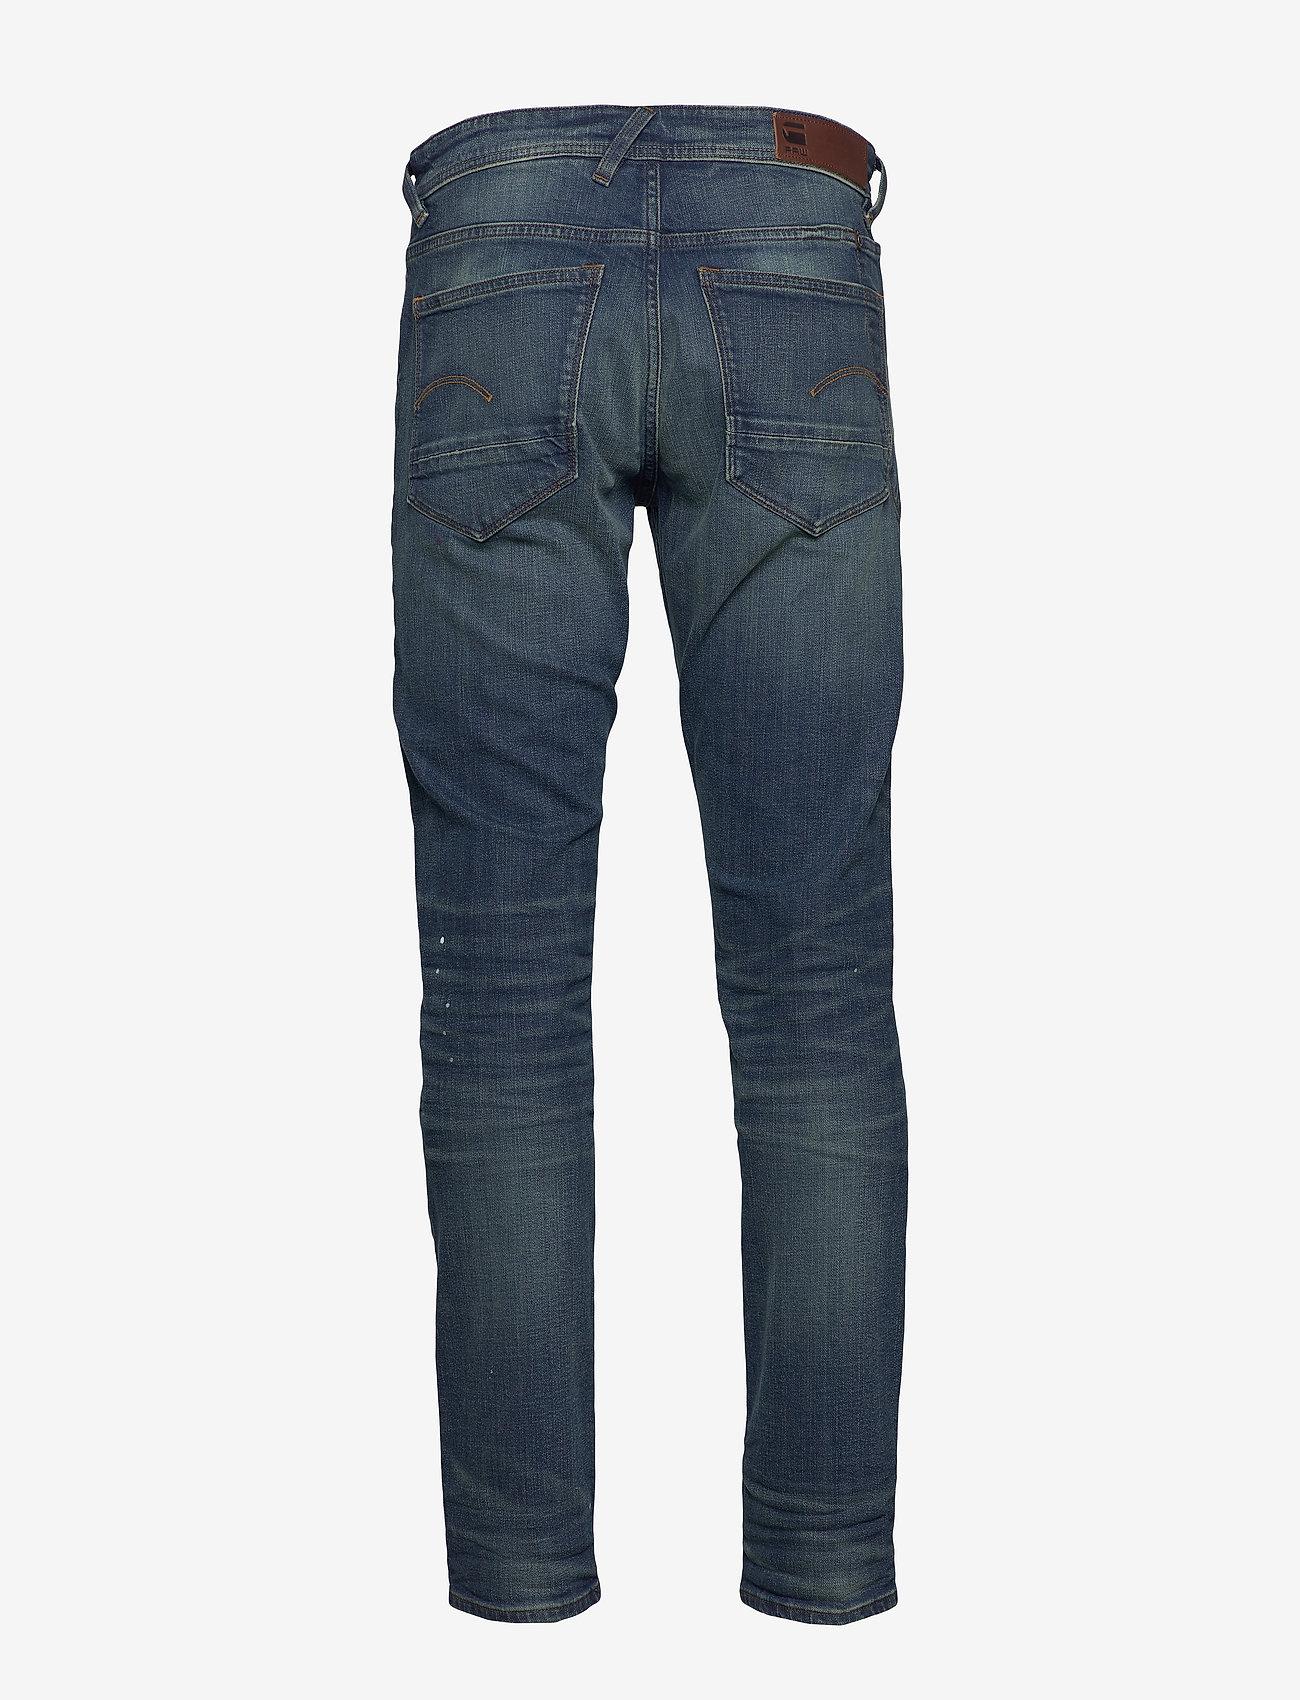 G-star RAW - G-bleid slim - slim jeans - antic faded lagoon - 1